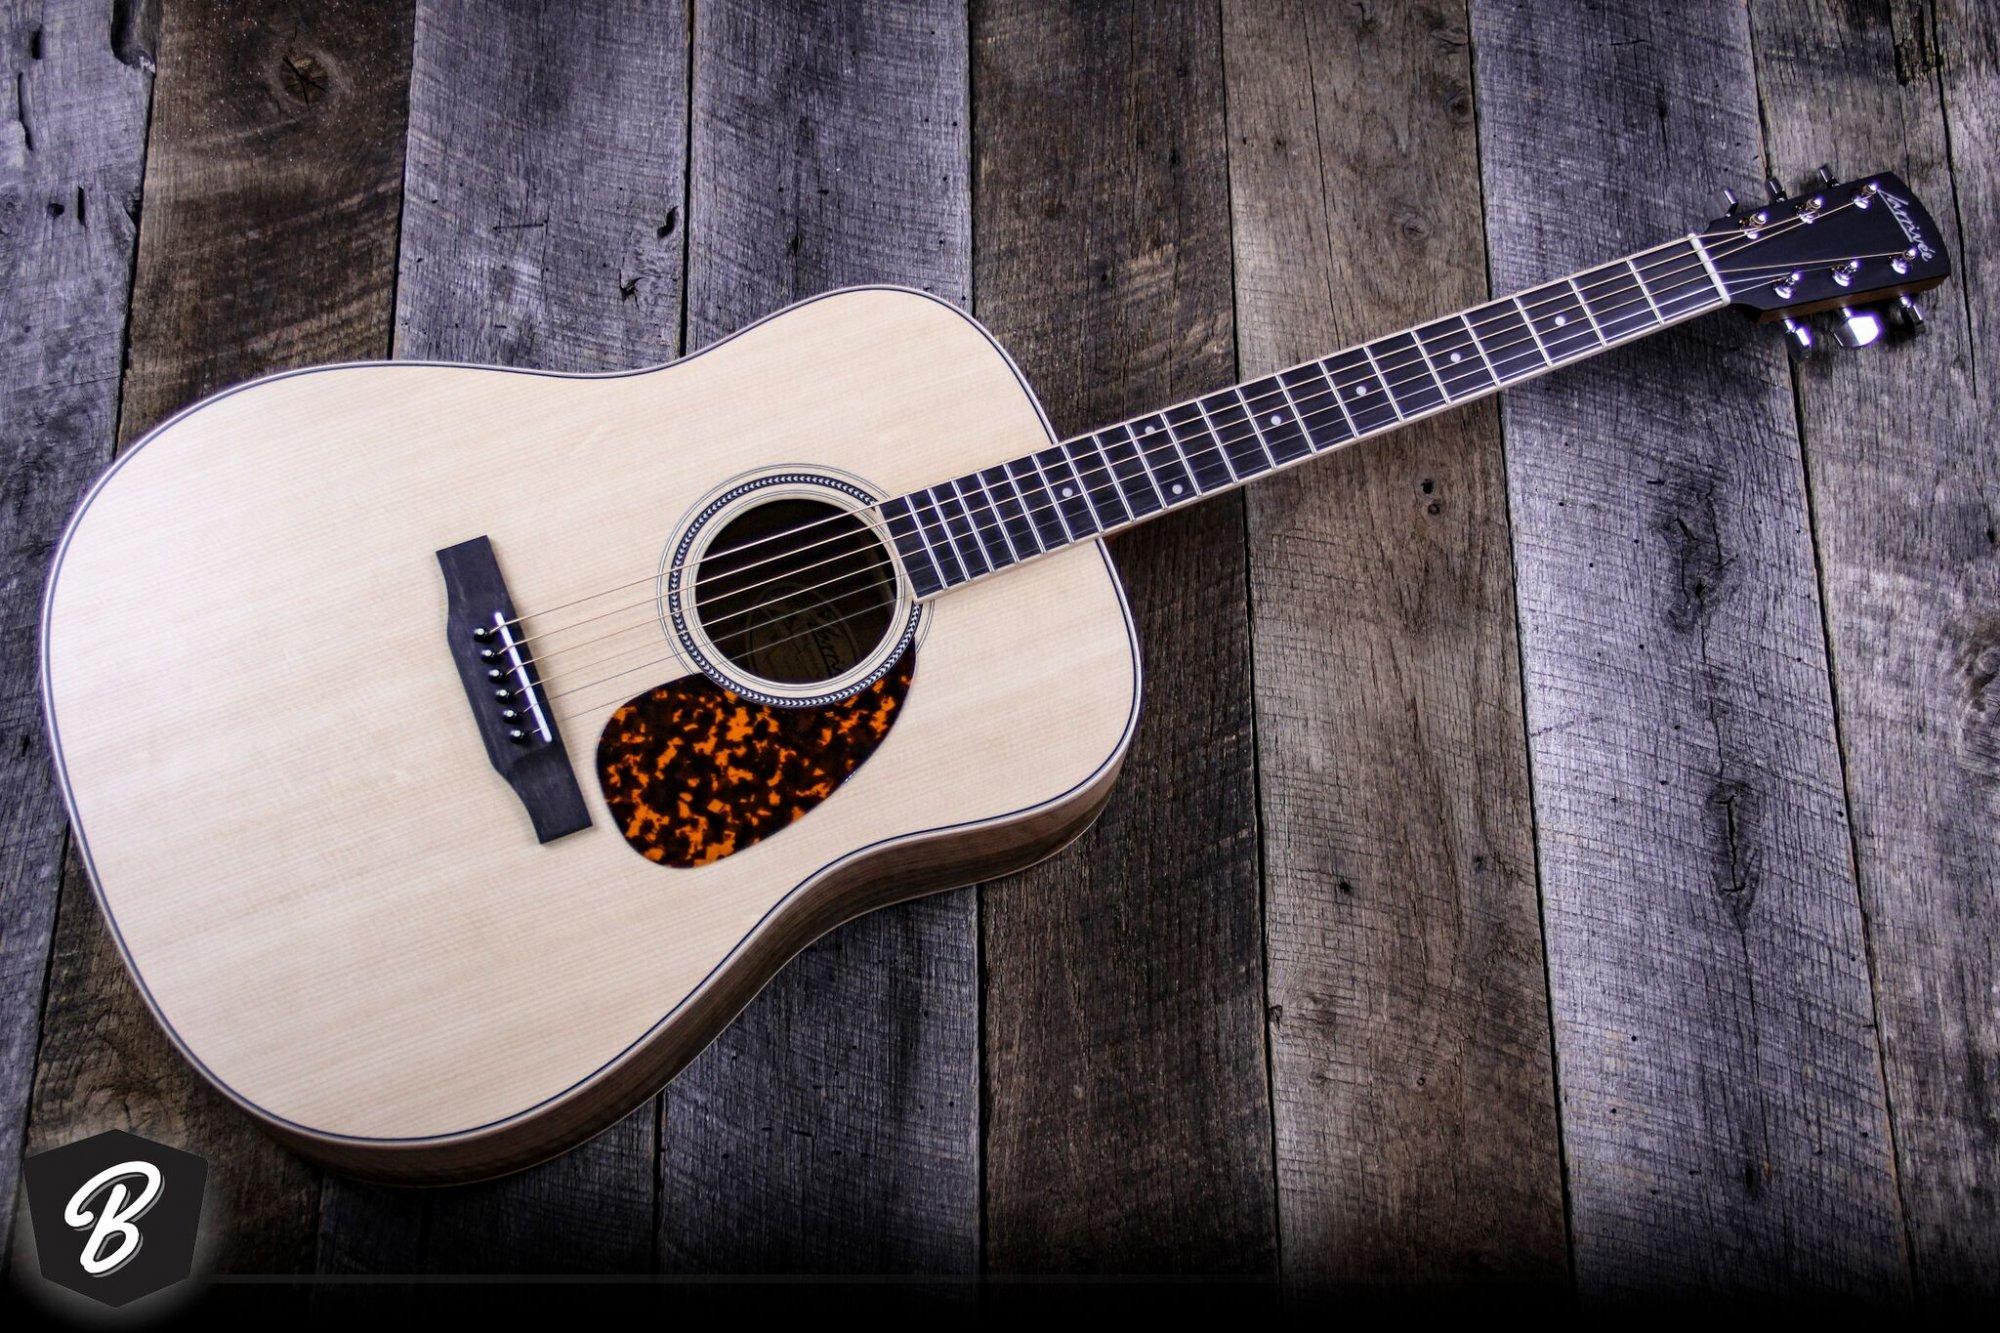 Larrivee D03FW0 Austrian Walnut Acoustic Guitar w/Case